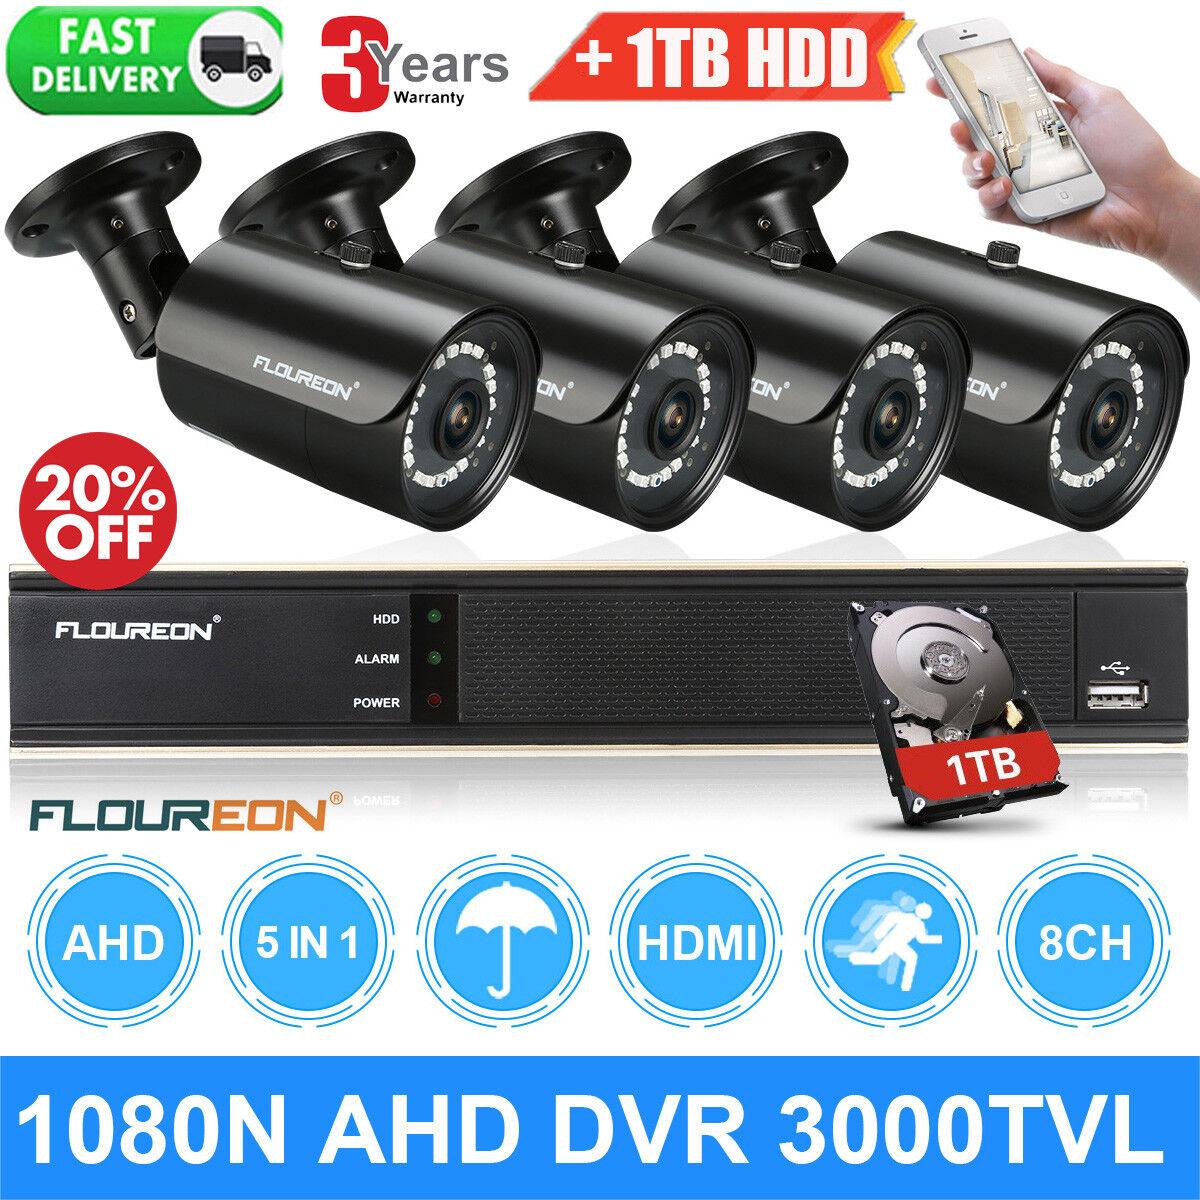 Laptop Windows - FLOUREON 8CH 1080N AHD CCTV DVR Outdoor 1080P Camera + 1TB HDD Security System